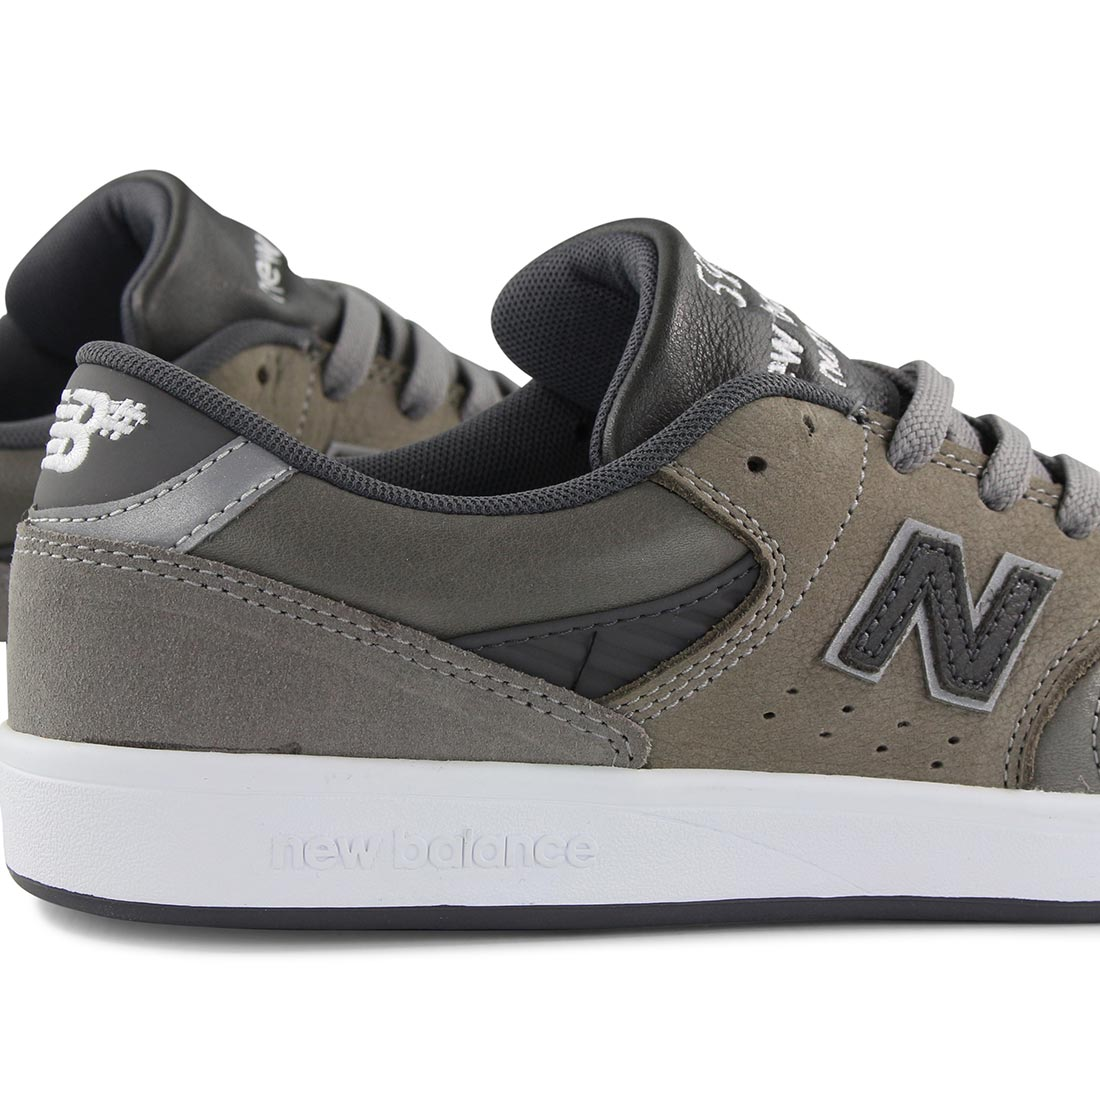 6d21a163dde2f New Balance Numeric 598 Shoes - Grey / Grey